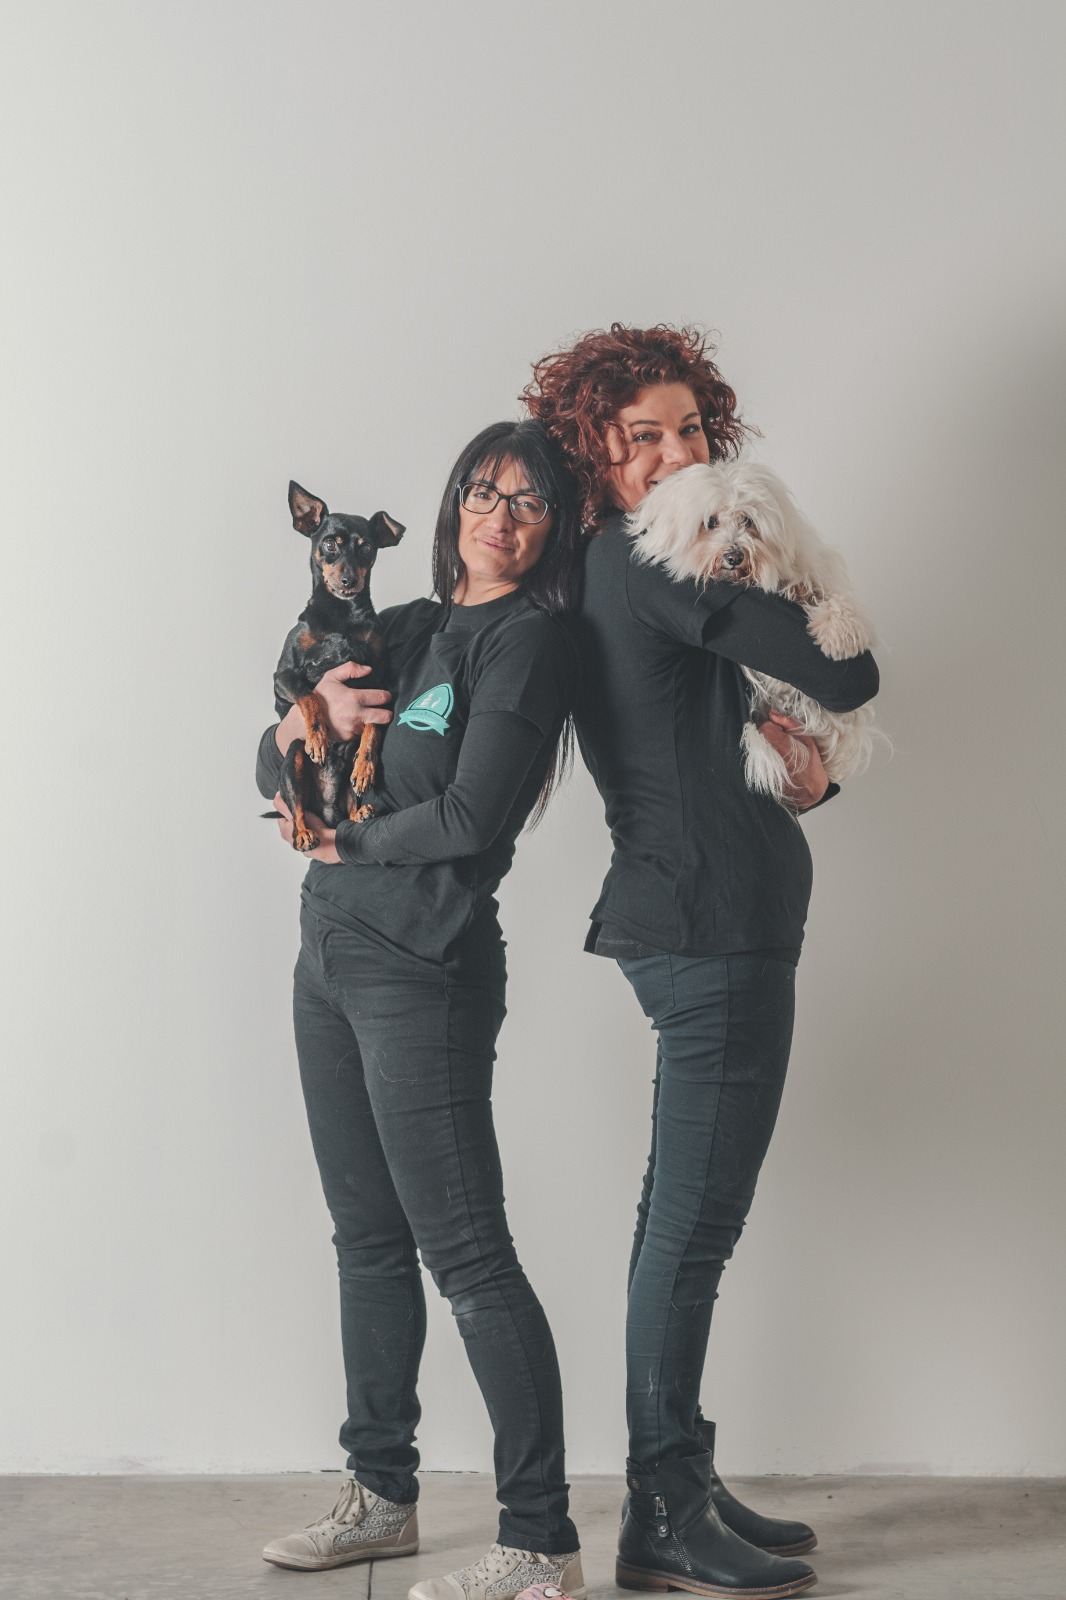 Canaglie da Matrimonio-Le Tue Wedding Dog Sisters!